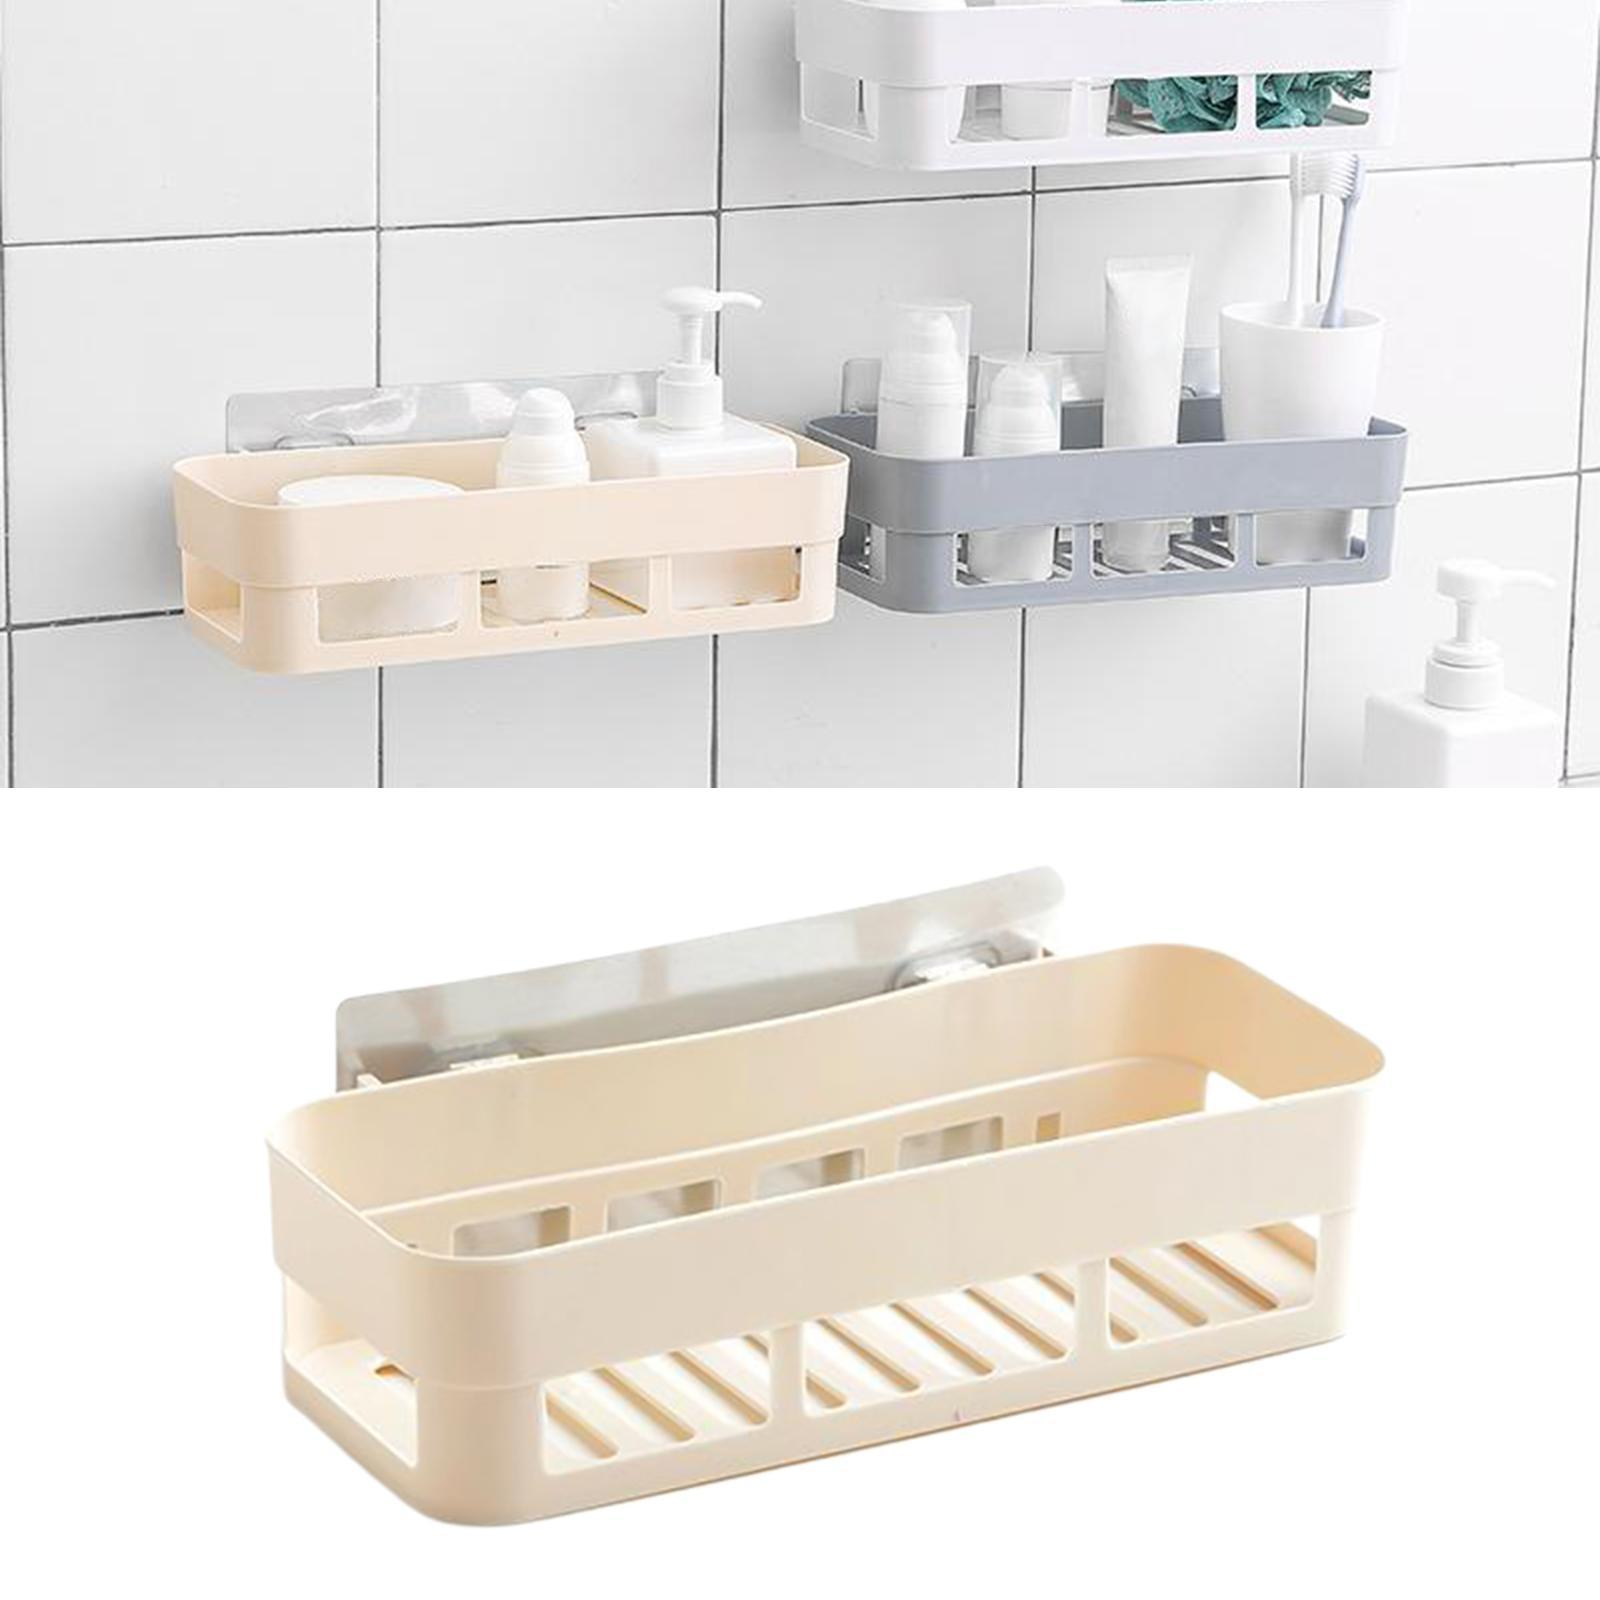 thumbnail 8 - Self-Adhesive-Shower-Shelf-Plastic-Shower-Caddy-Organiser-Bathroom-Shelf